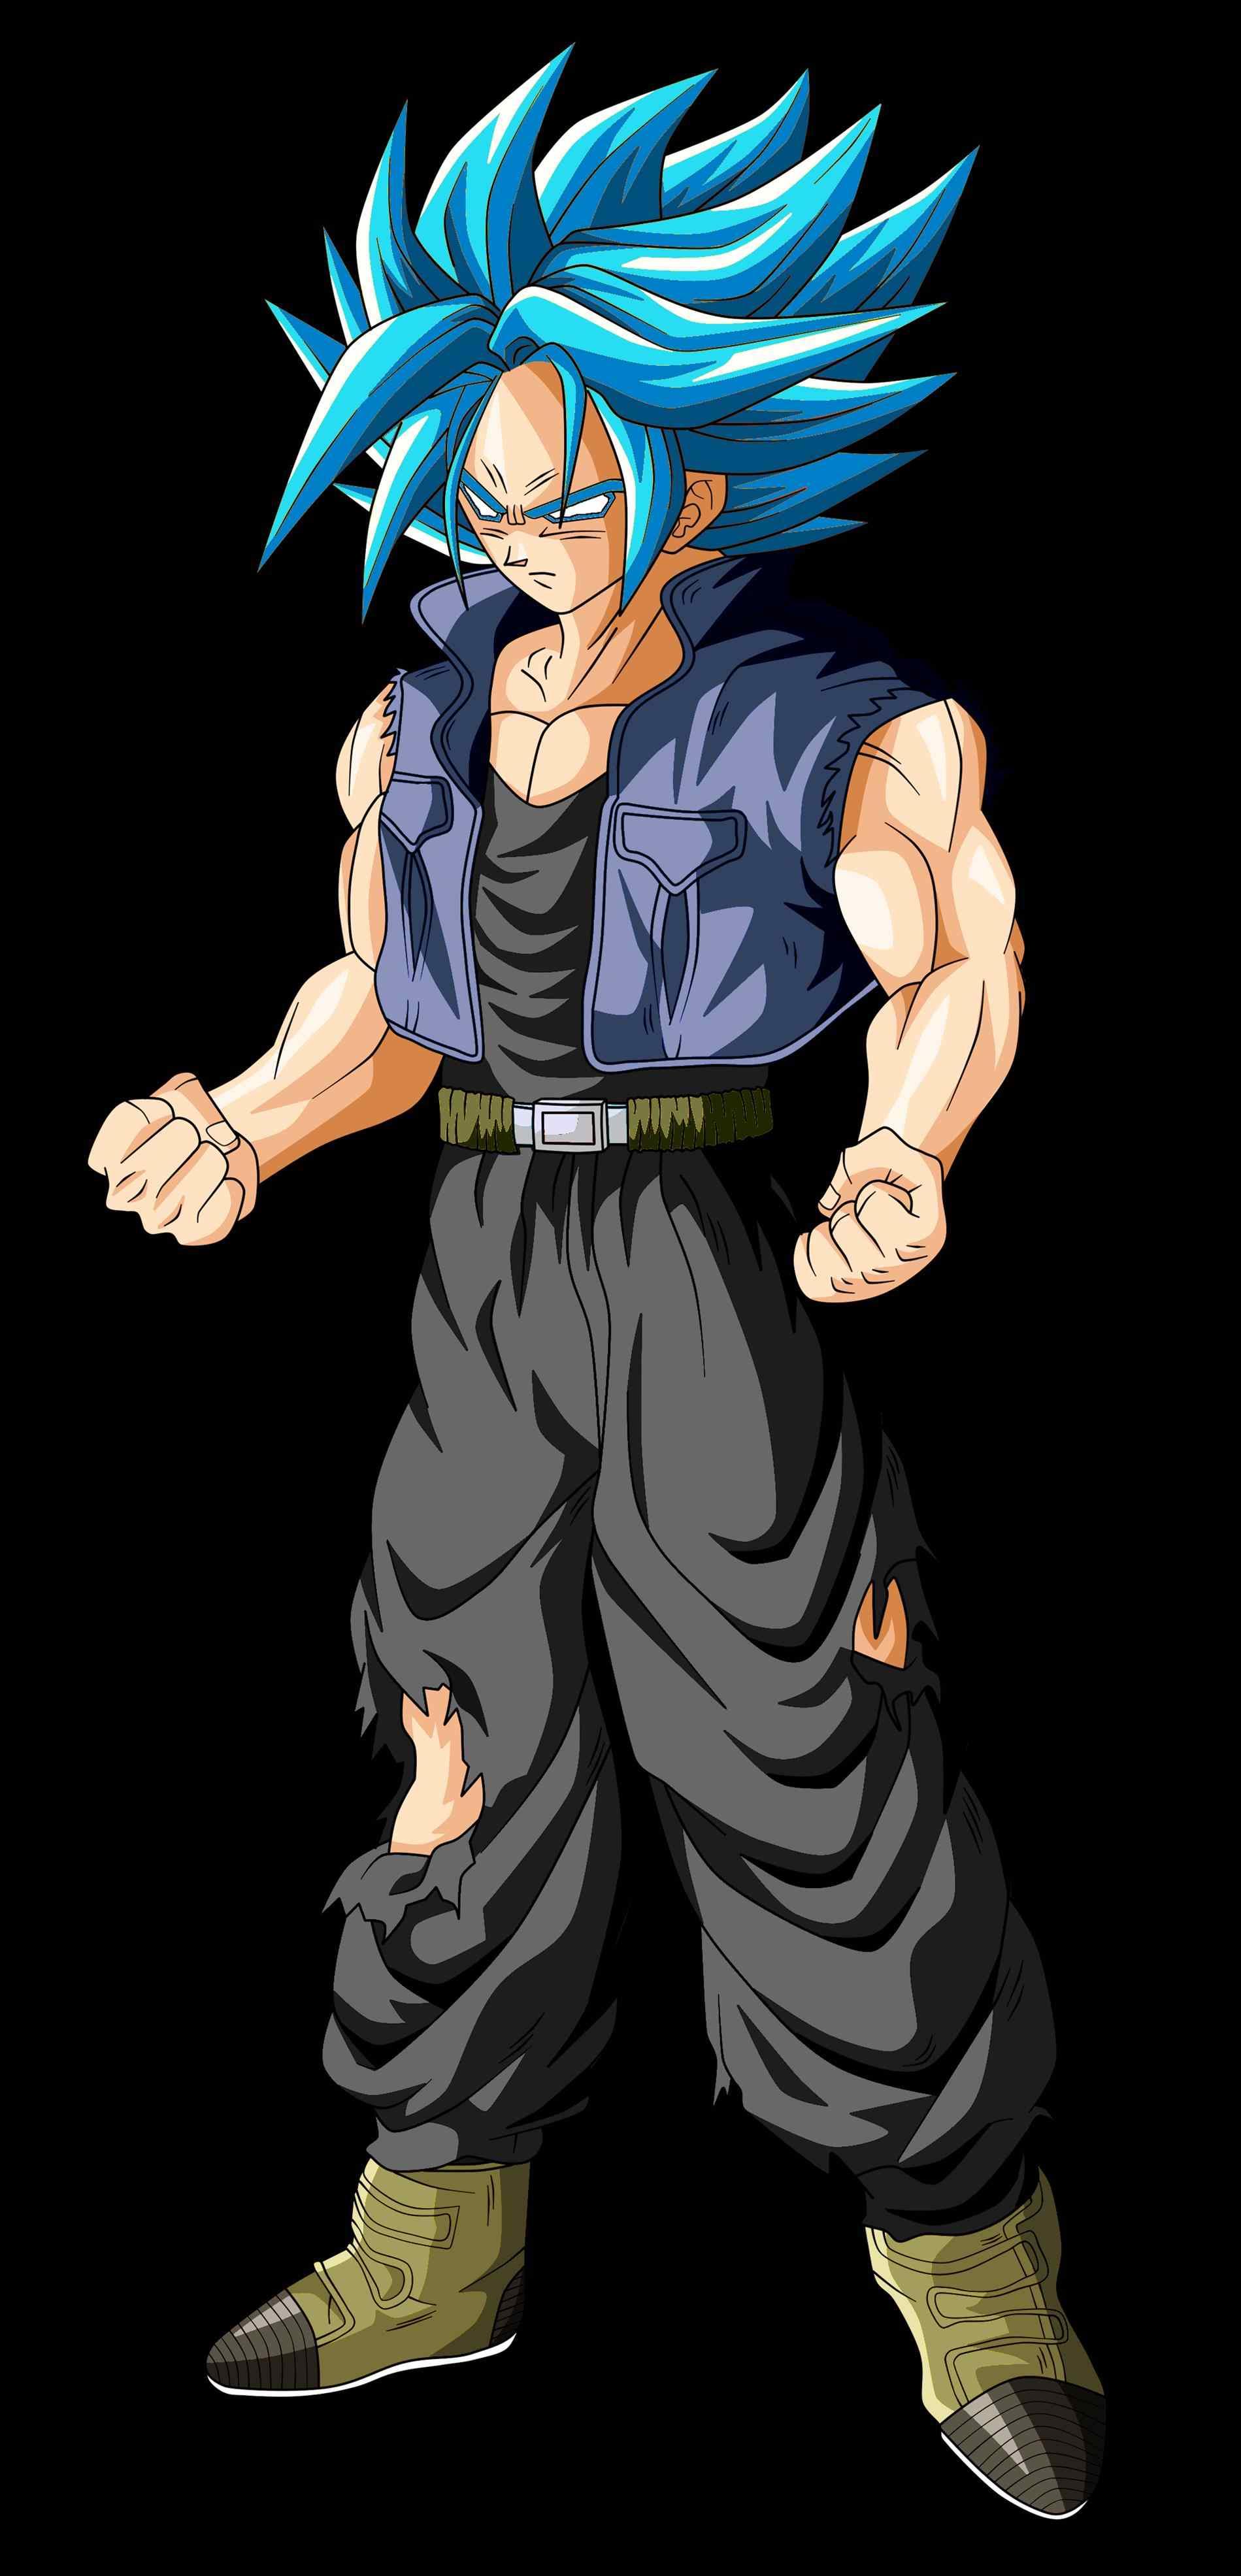 Future Trunks Super Saiyan 4